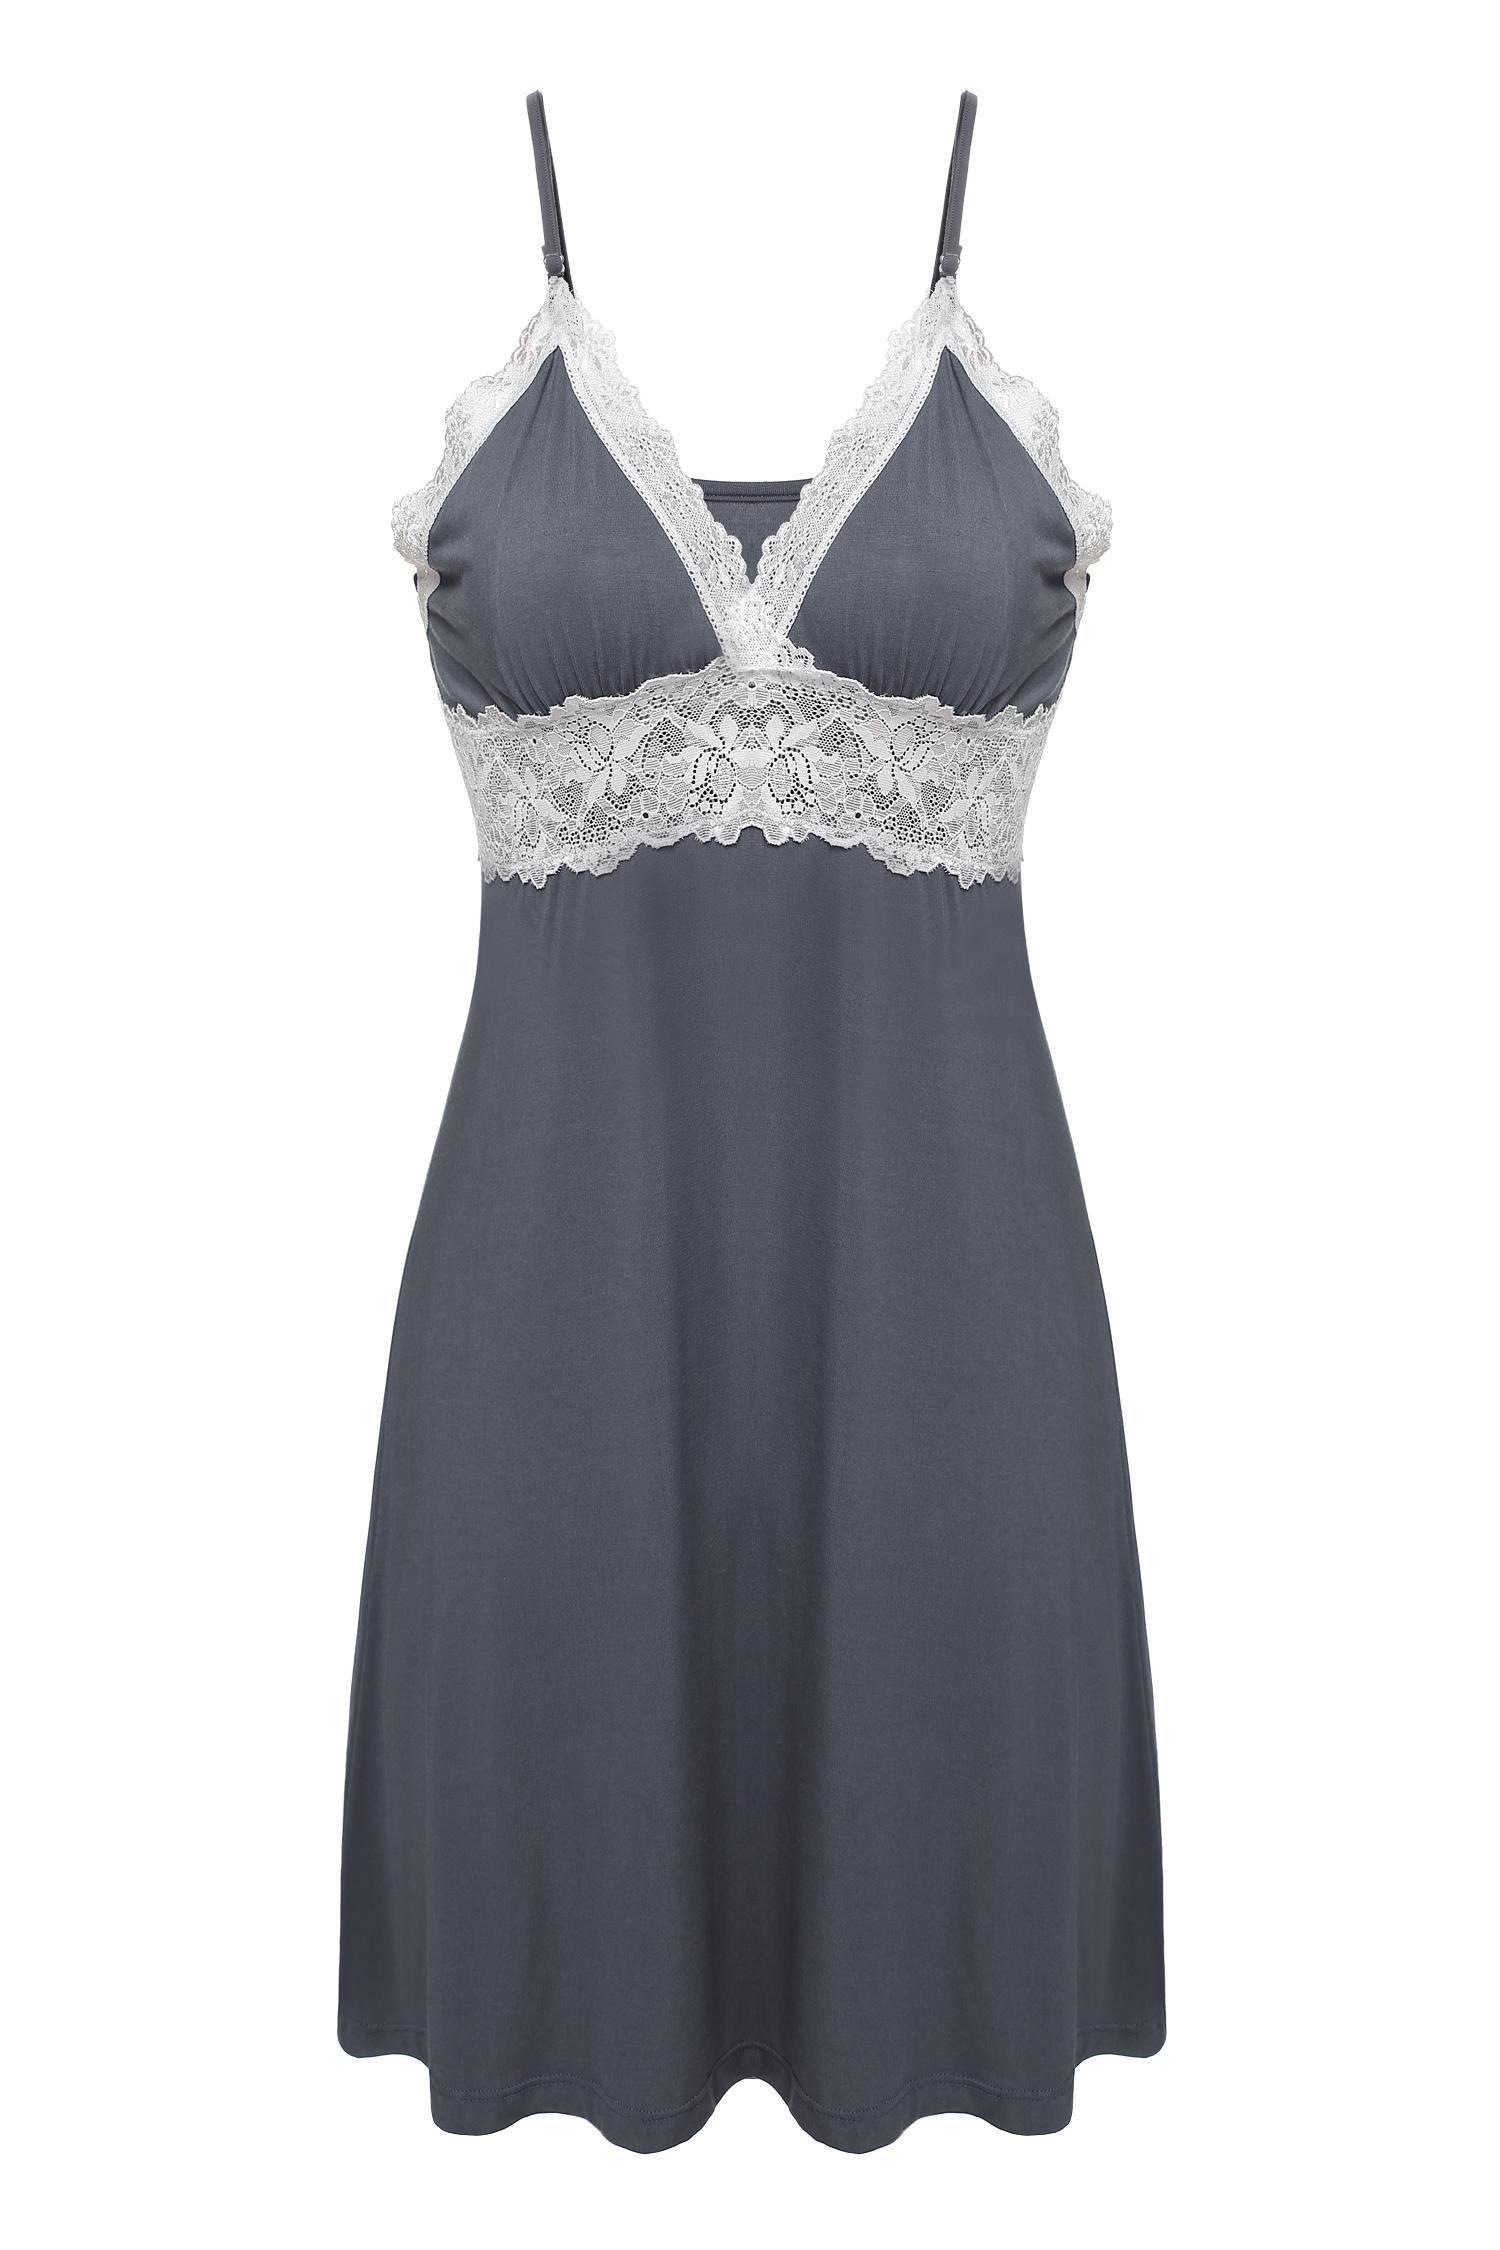 Ekouaer Nightdress Womens Lace Chemise,Viscose-gray,Large